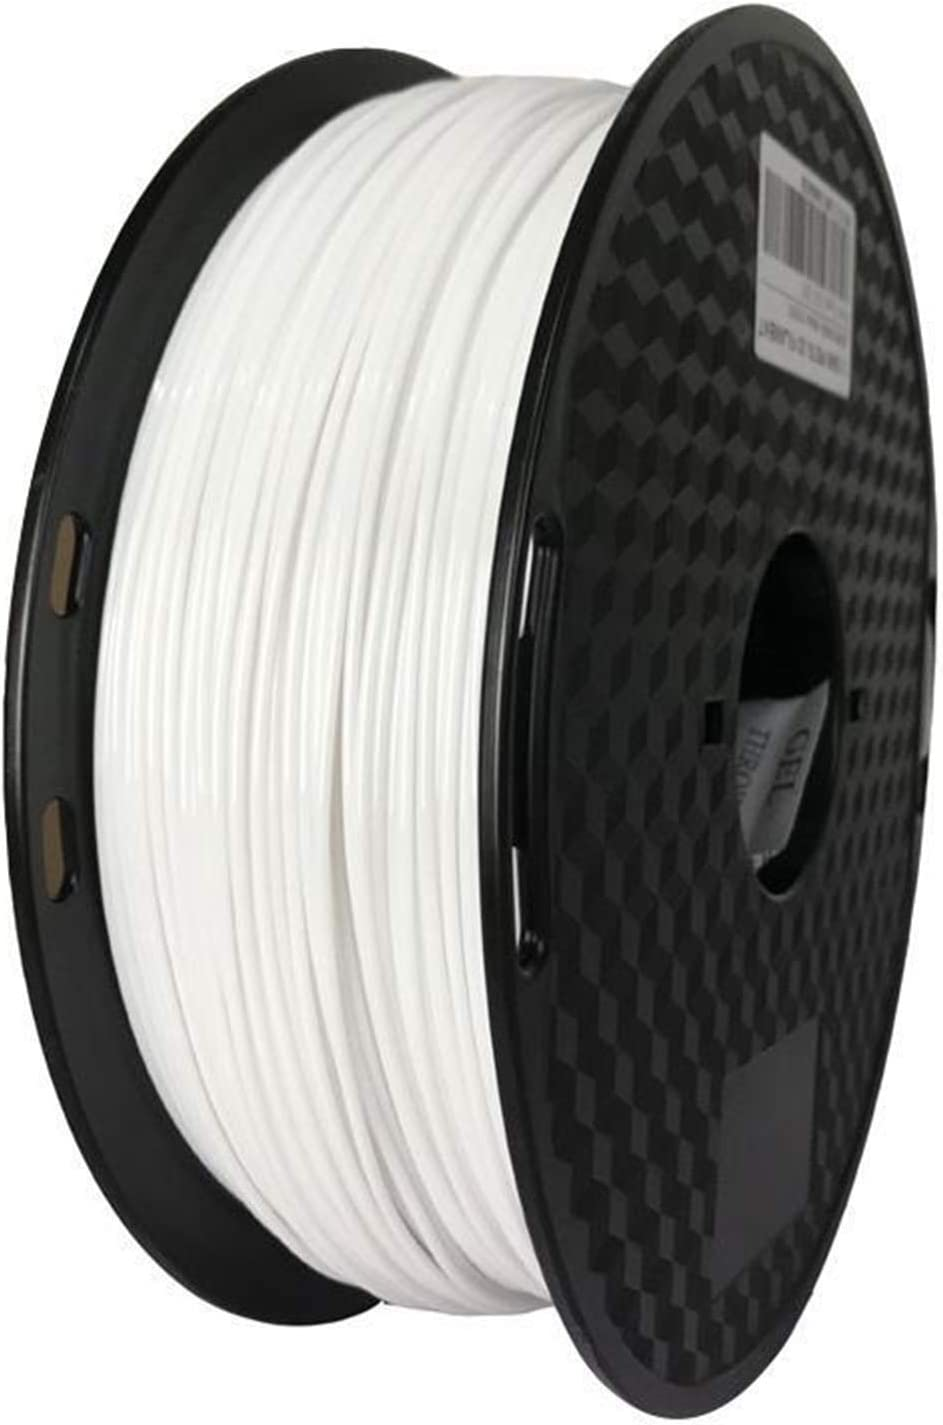 1kg Cheap sale PETG 3D Printing Filament 1.75mm Popular PET Max 45% OFF Color Plastic